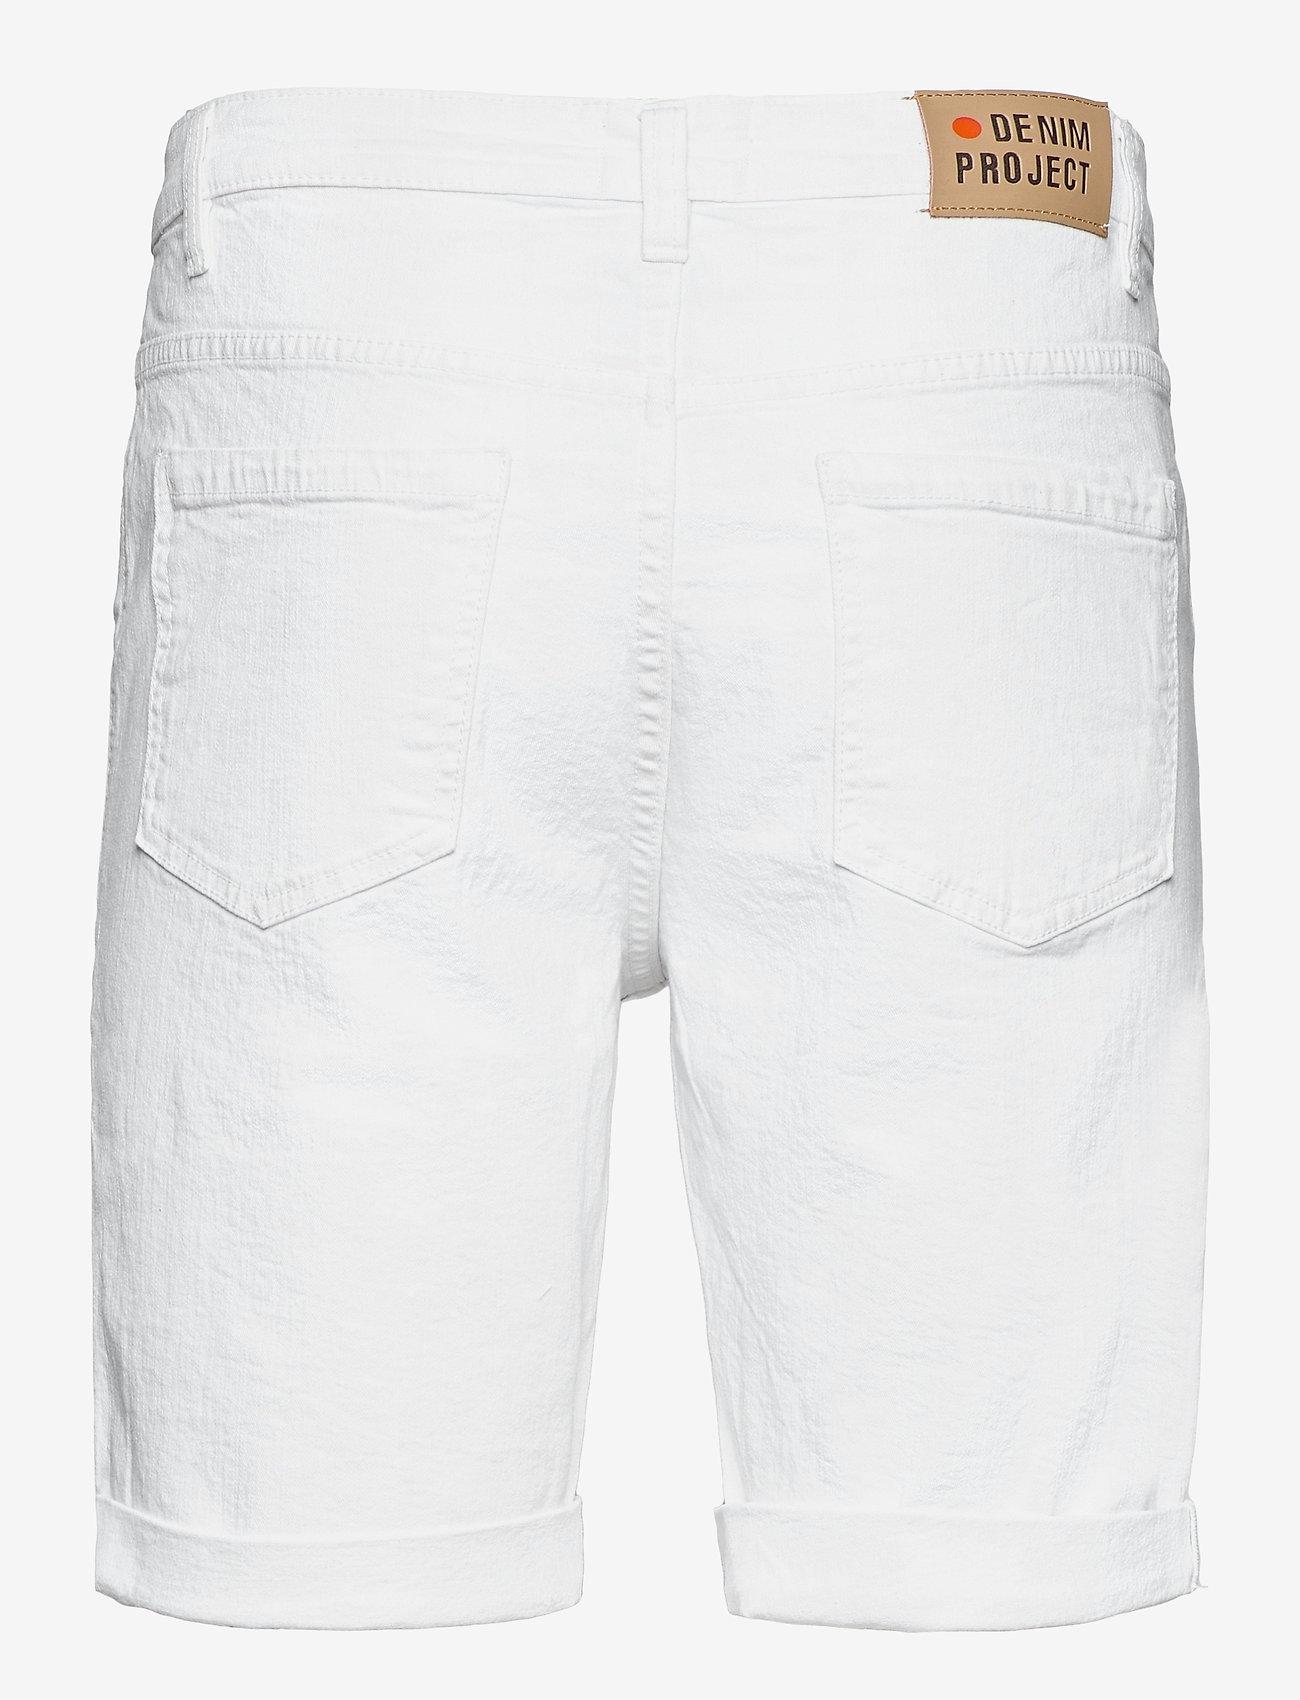 Denim project - Mr. Orange - denim shorts - 002 white - 1